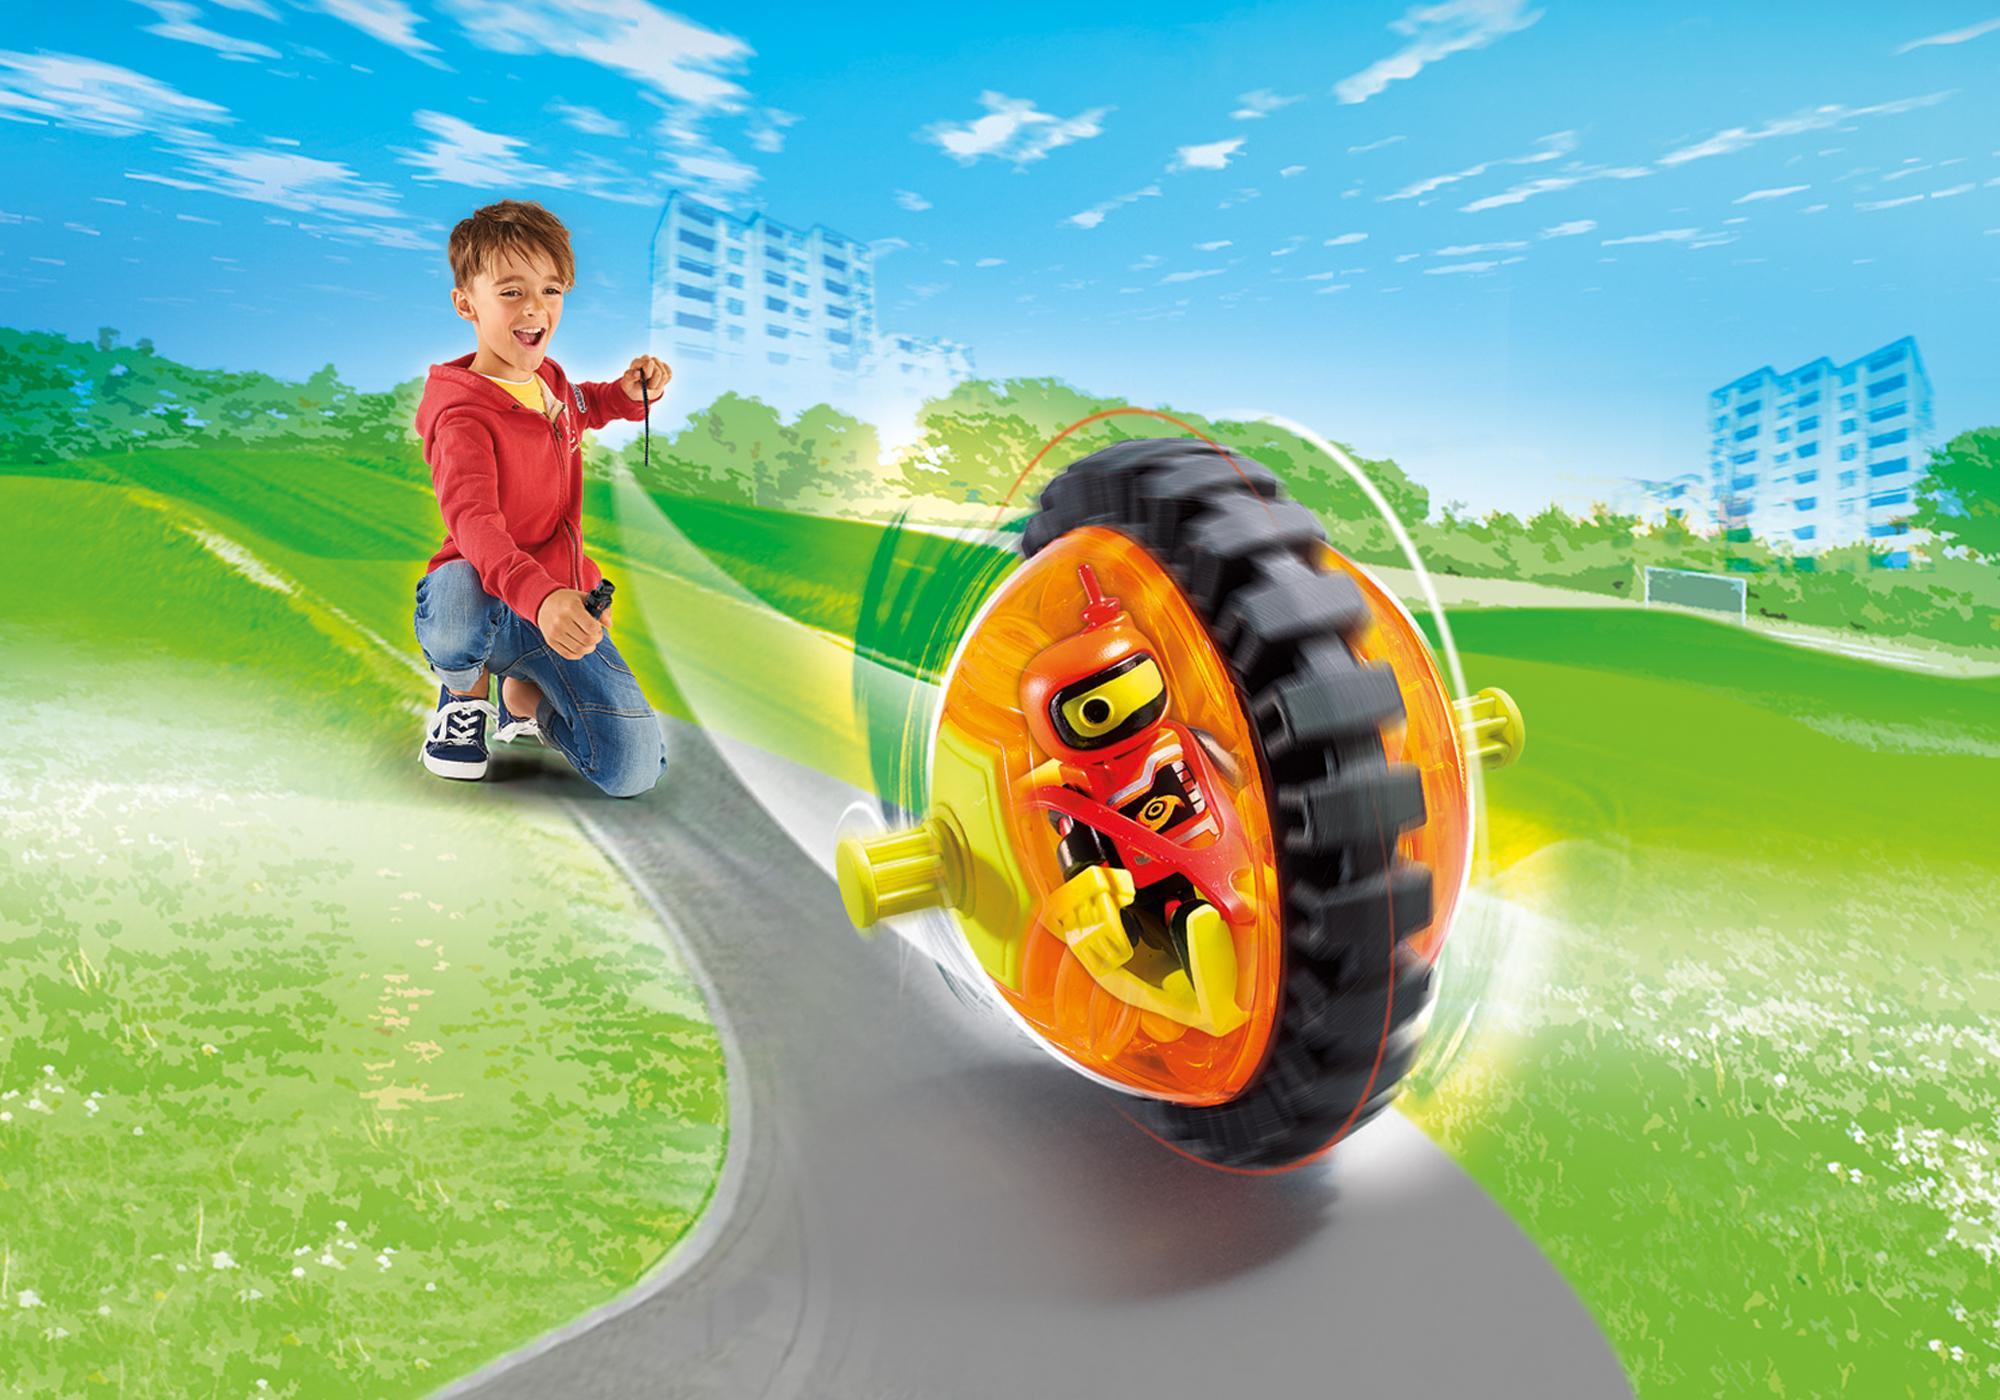 http://media.playmobil.com/i/playmobil/9203_product_detail/Speed Roller arancio con robot